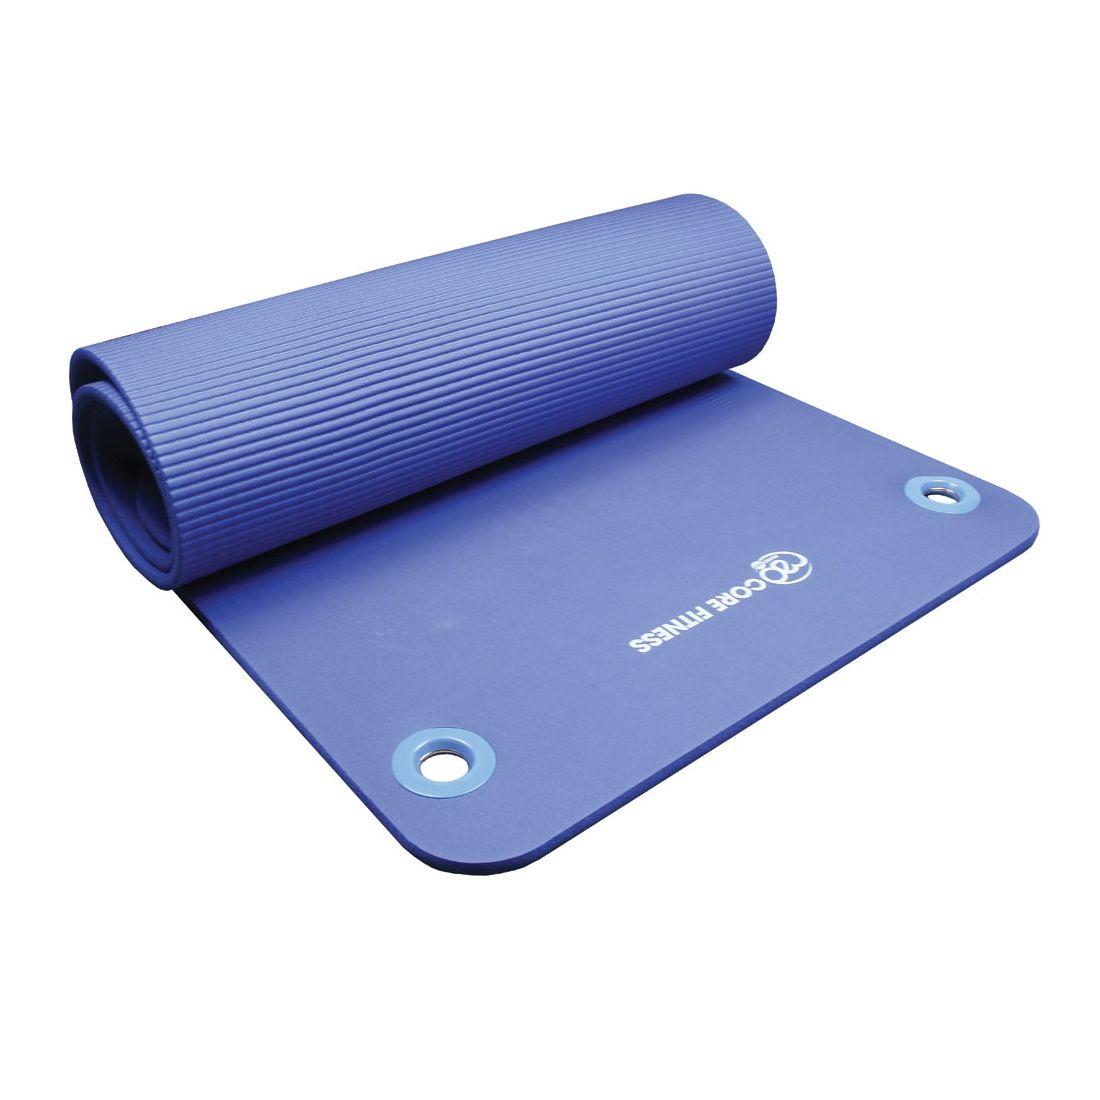 Core Fitness Plus Mat 15mm